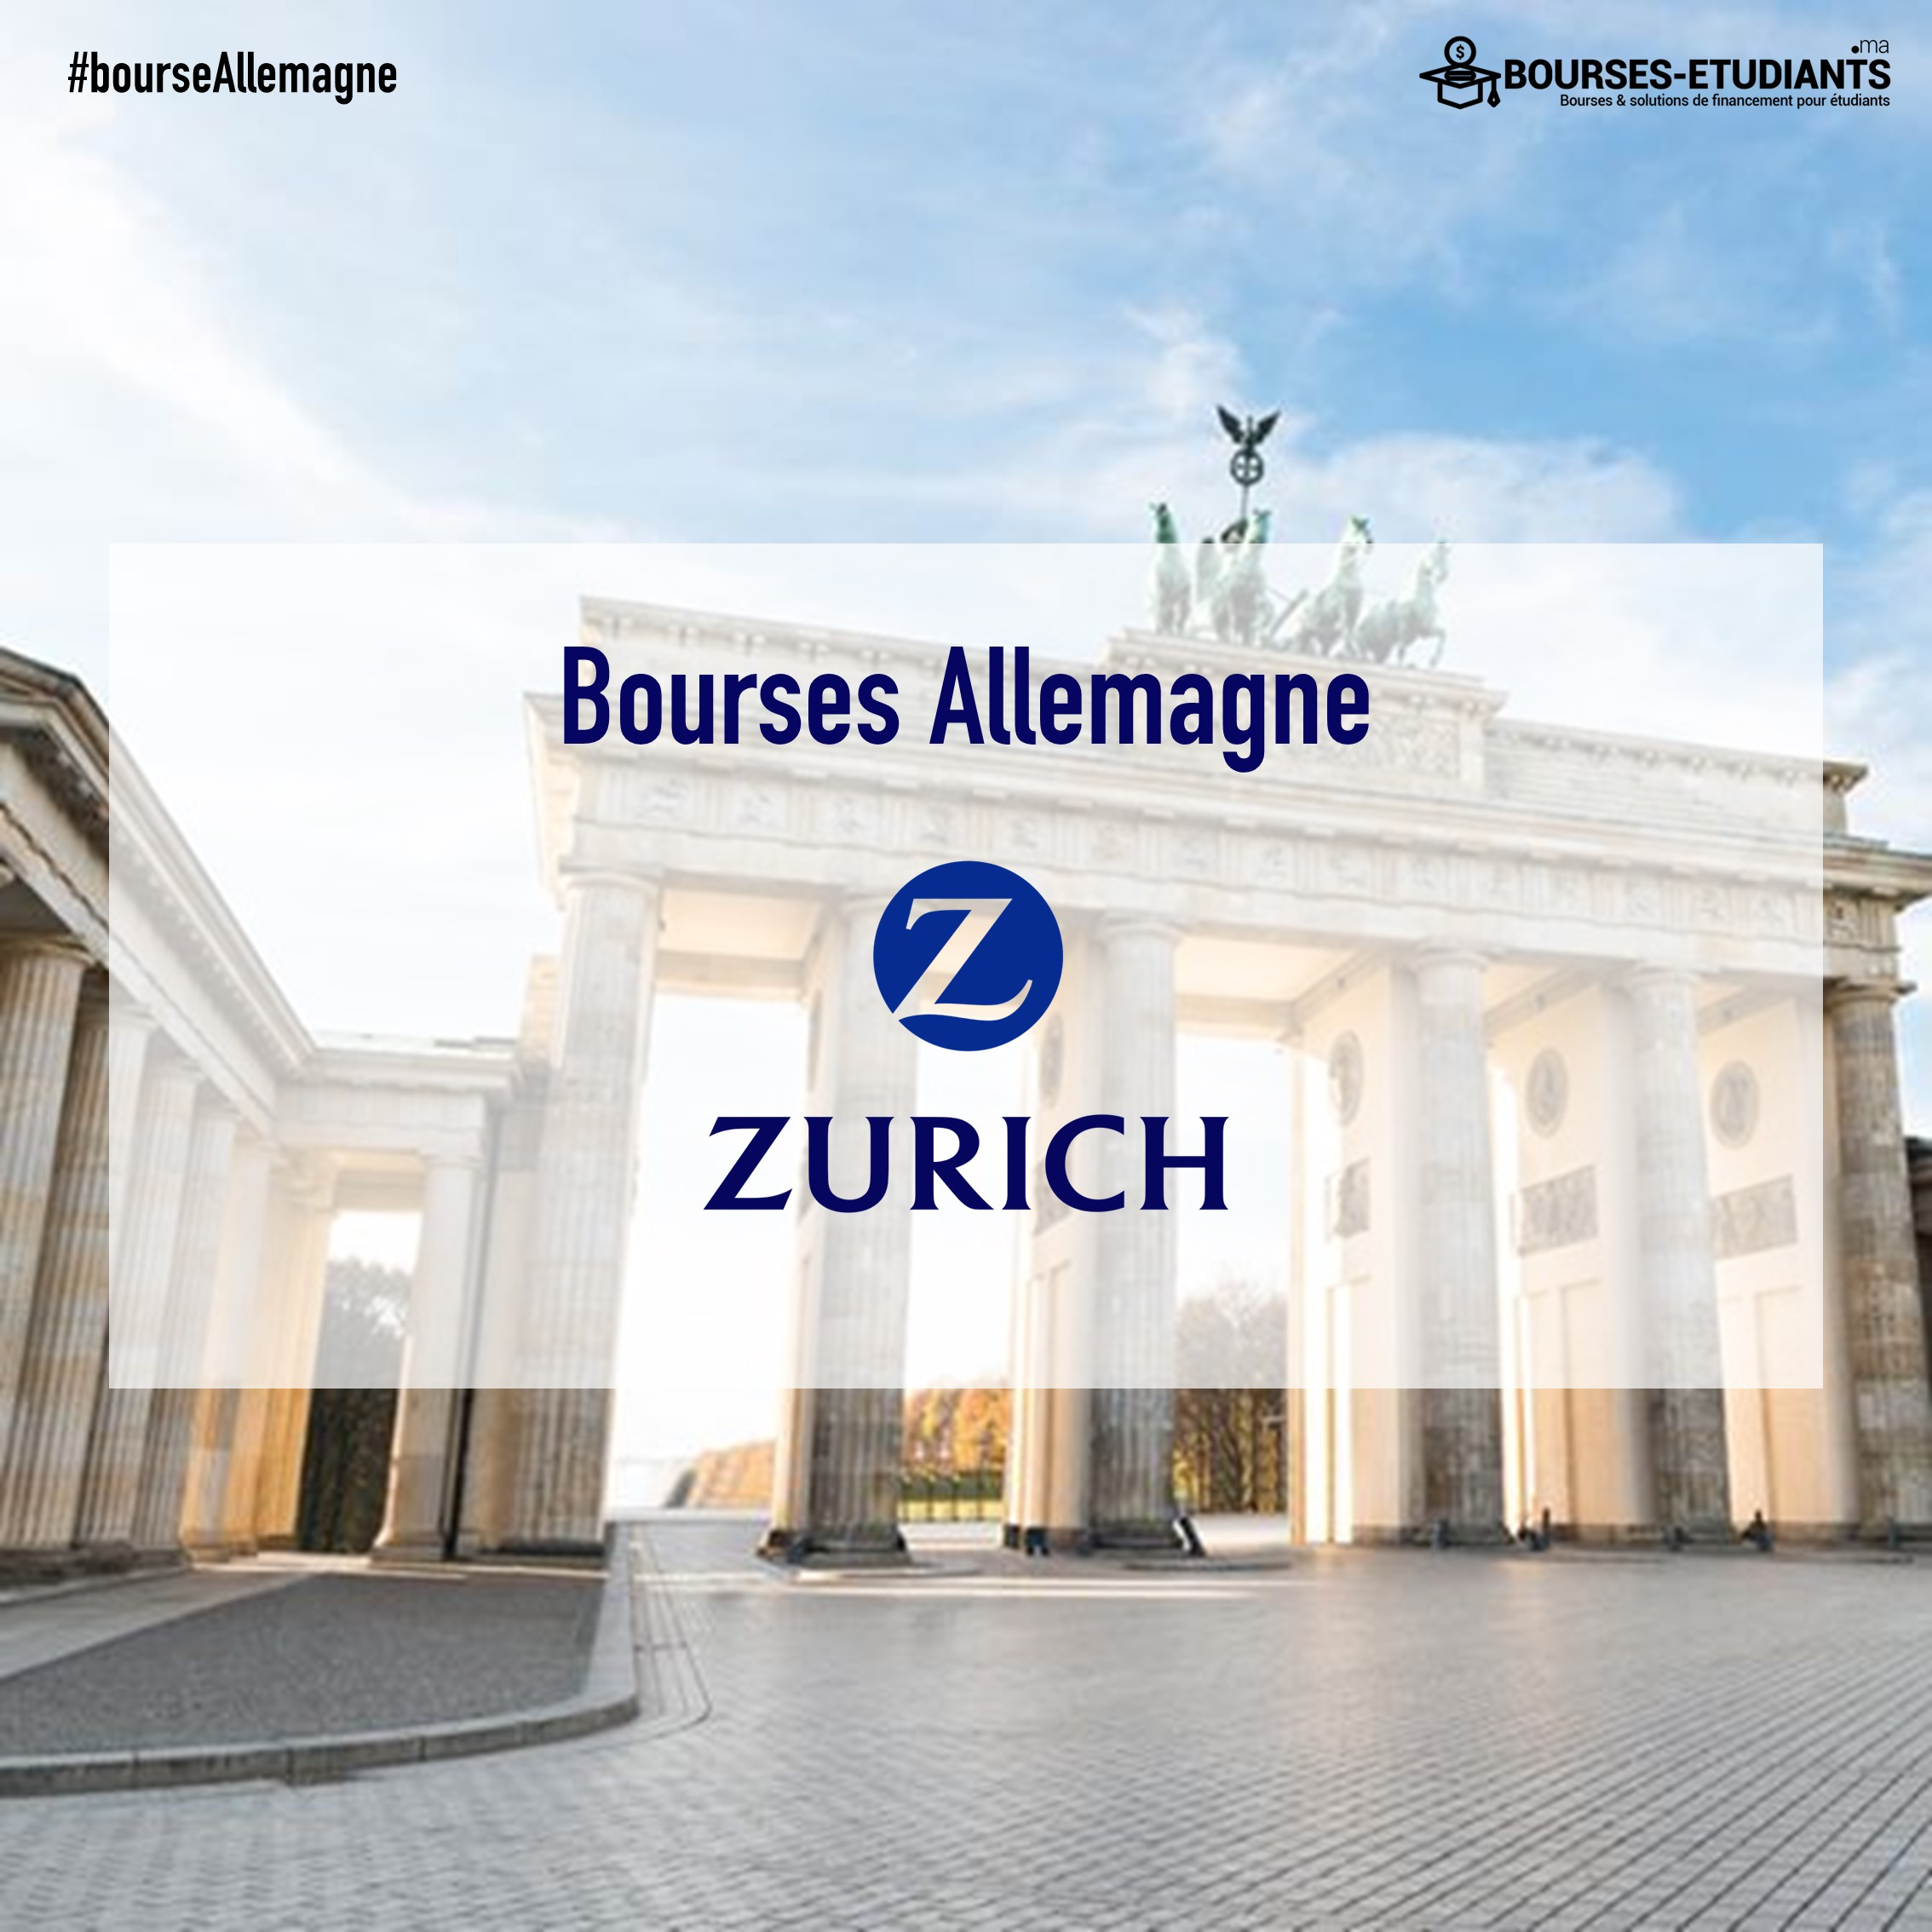 Bourses Allemagne